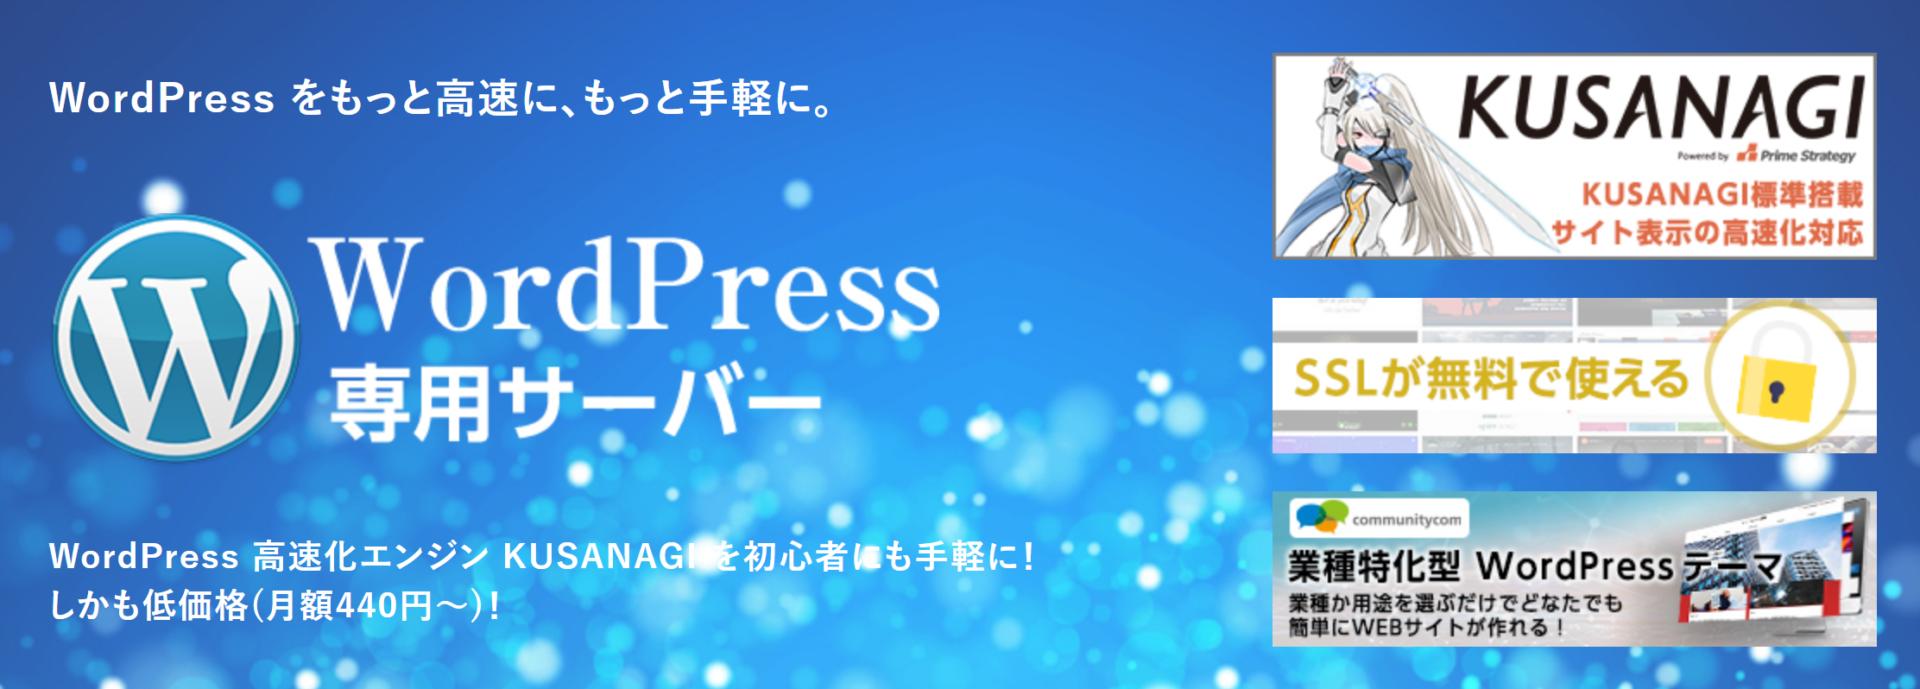 WordPress専用サーバーリンク画像